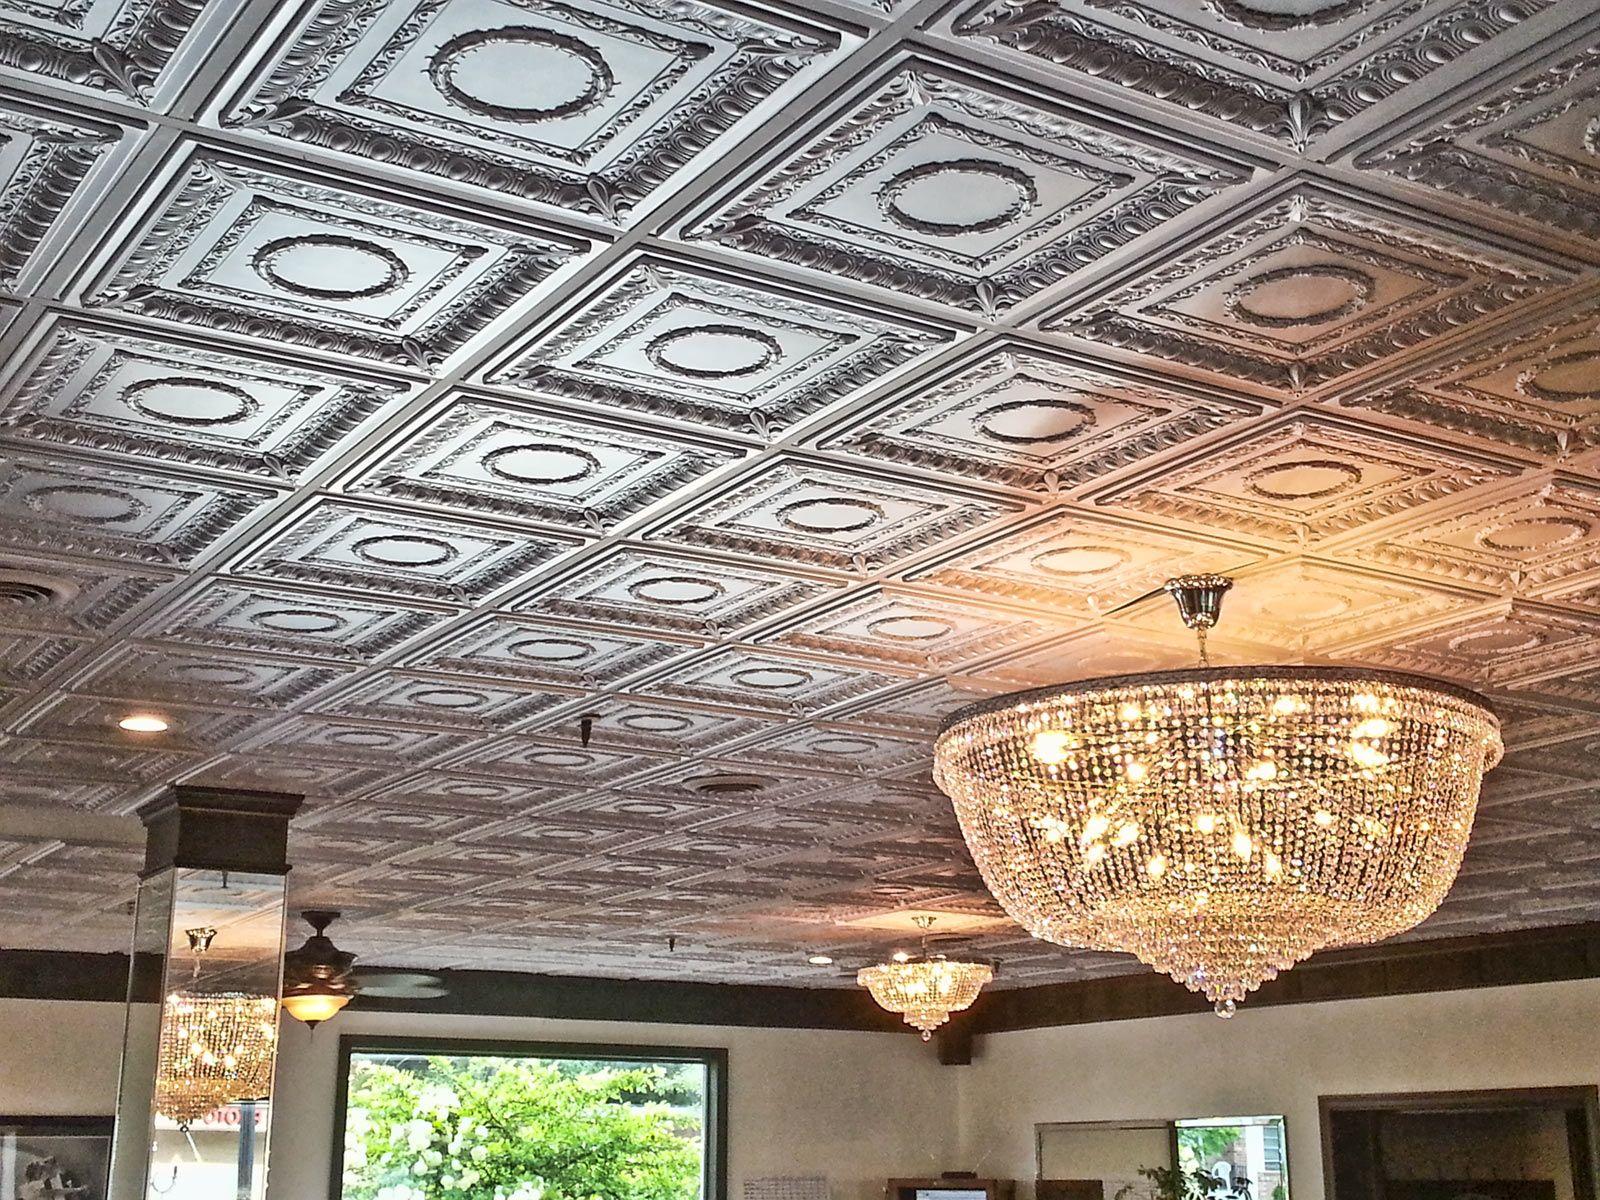 Decorative Ceiling Tiles Basement Ceiling Proceilingtiles Tin Ceiling Ceiling Tiles Drop Ceiling Lighting